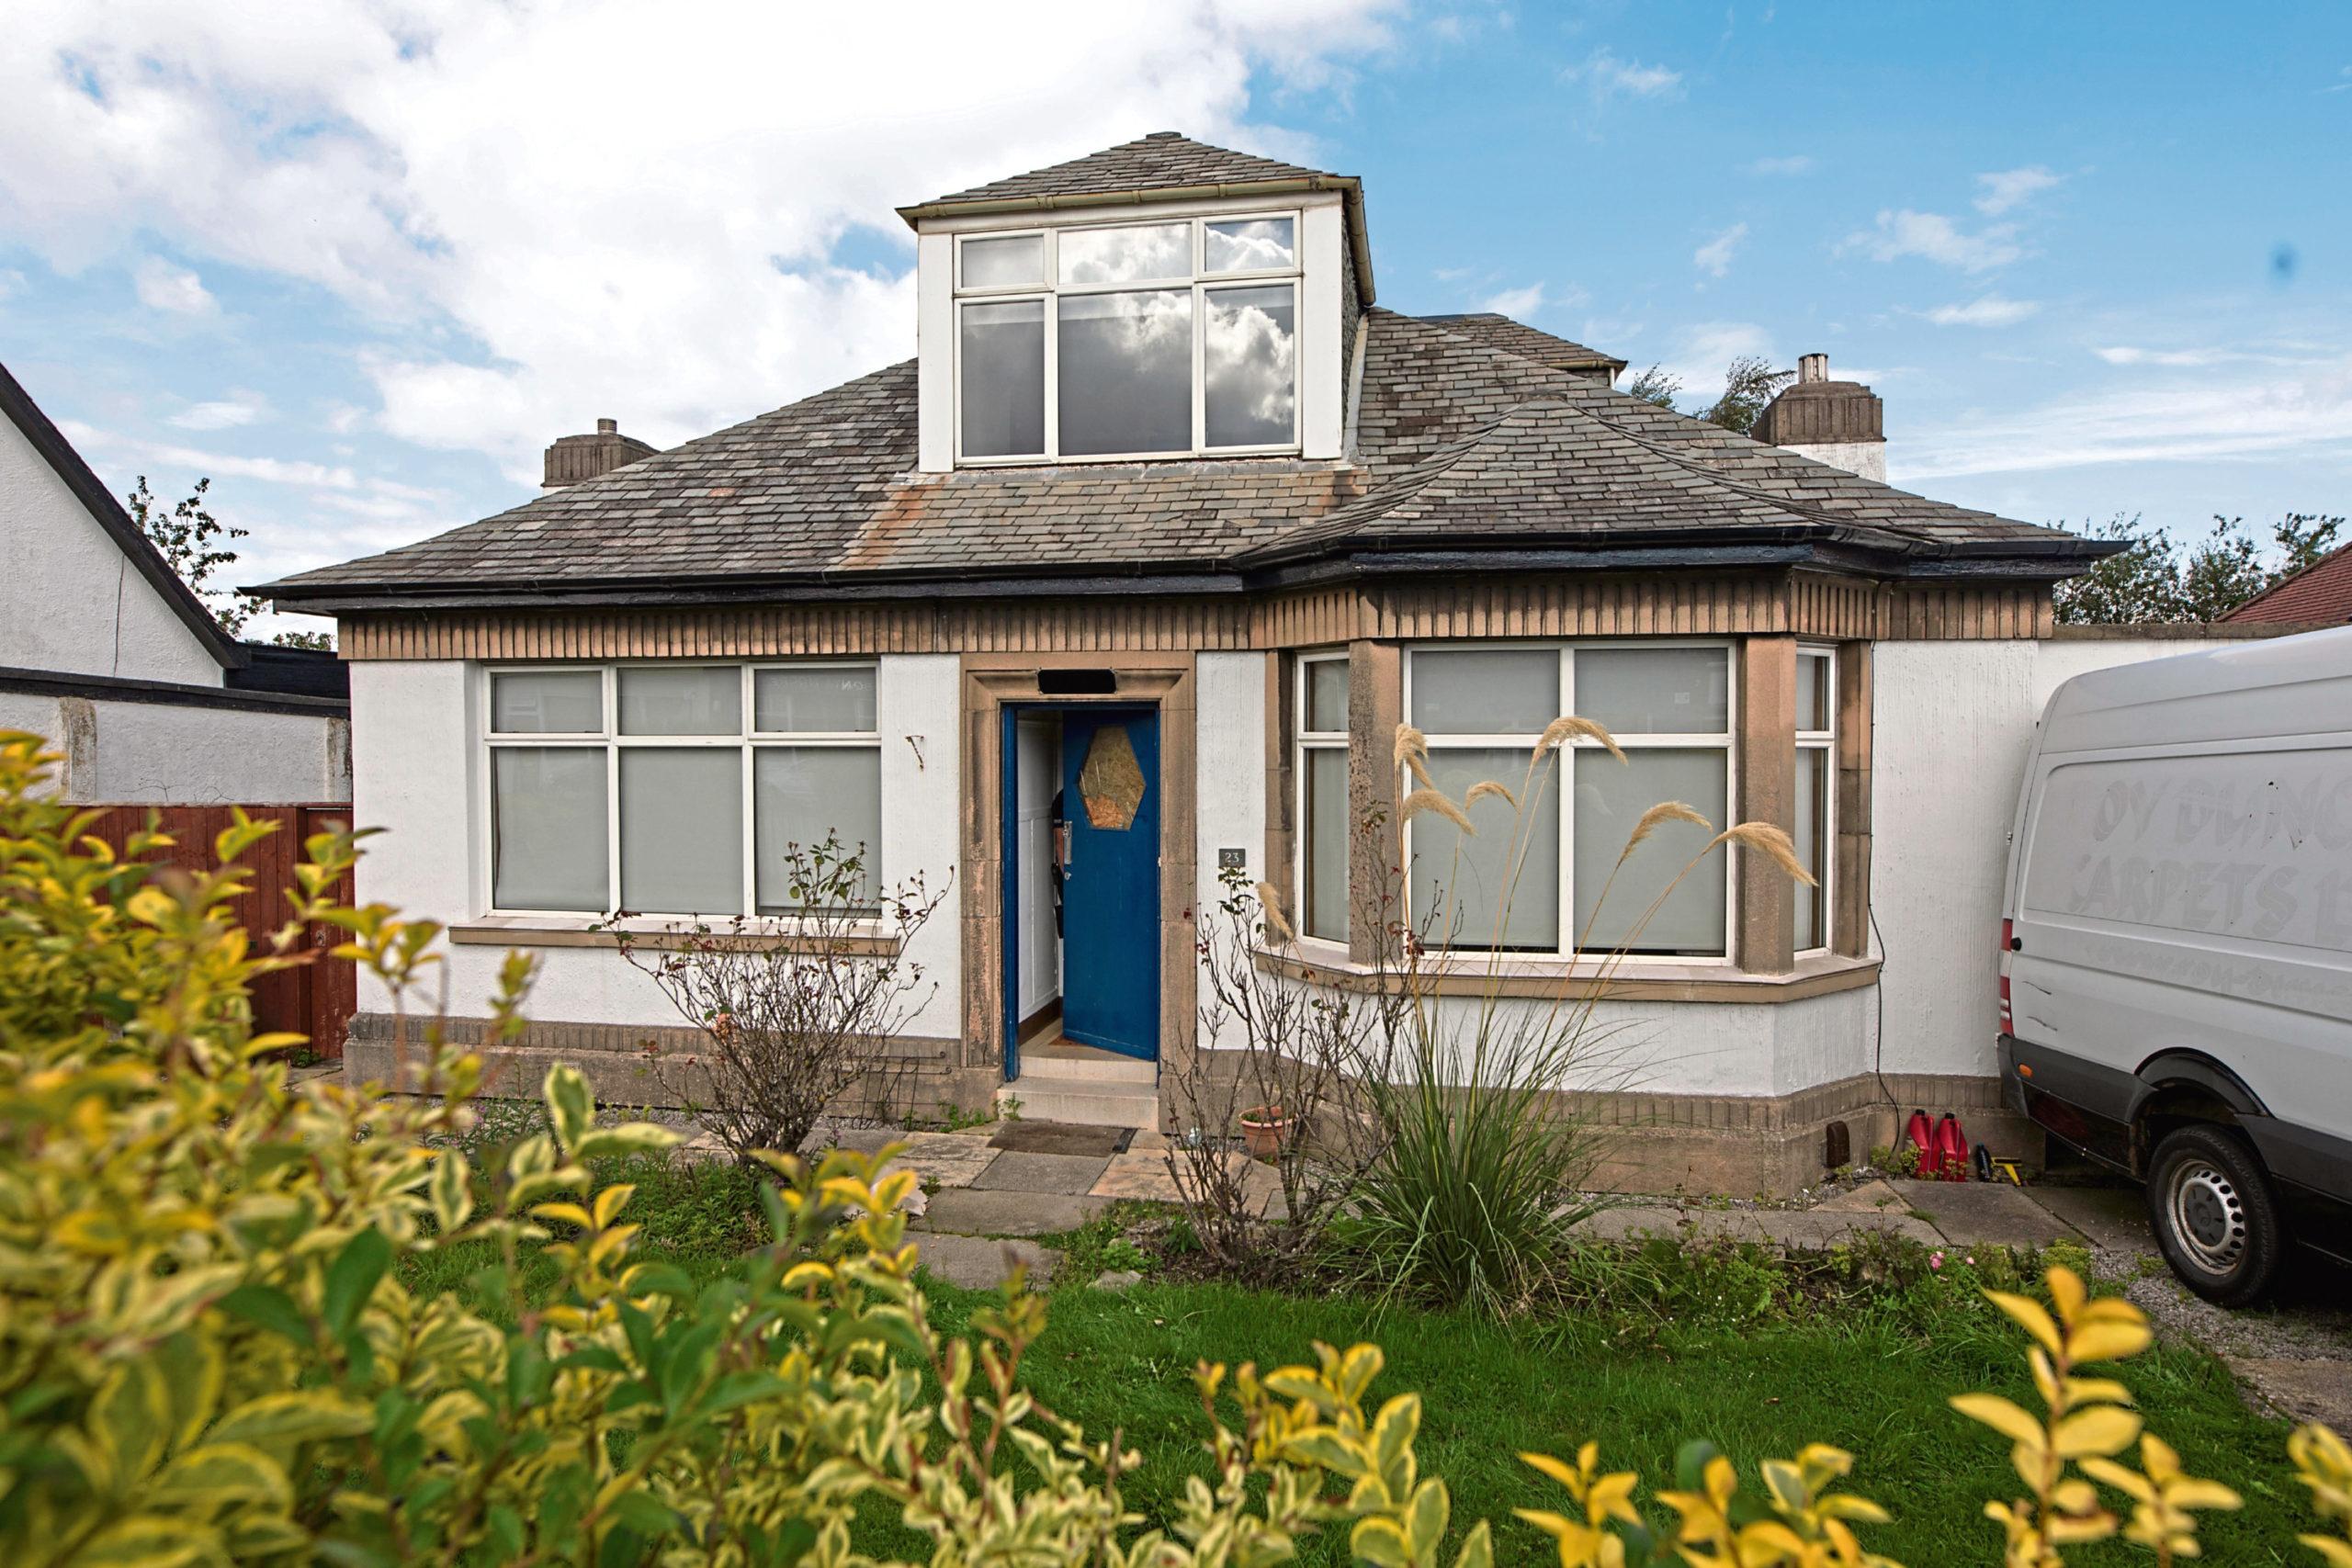 The Edinburgh bungalow raided by police